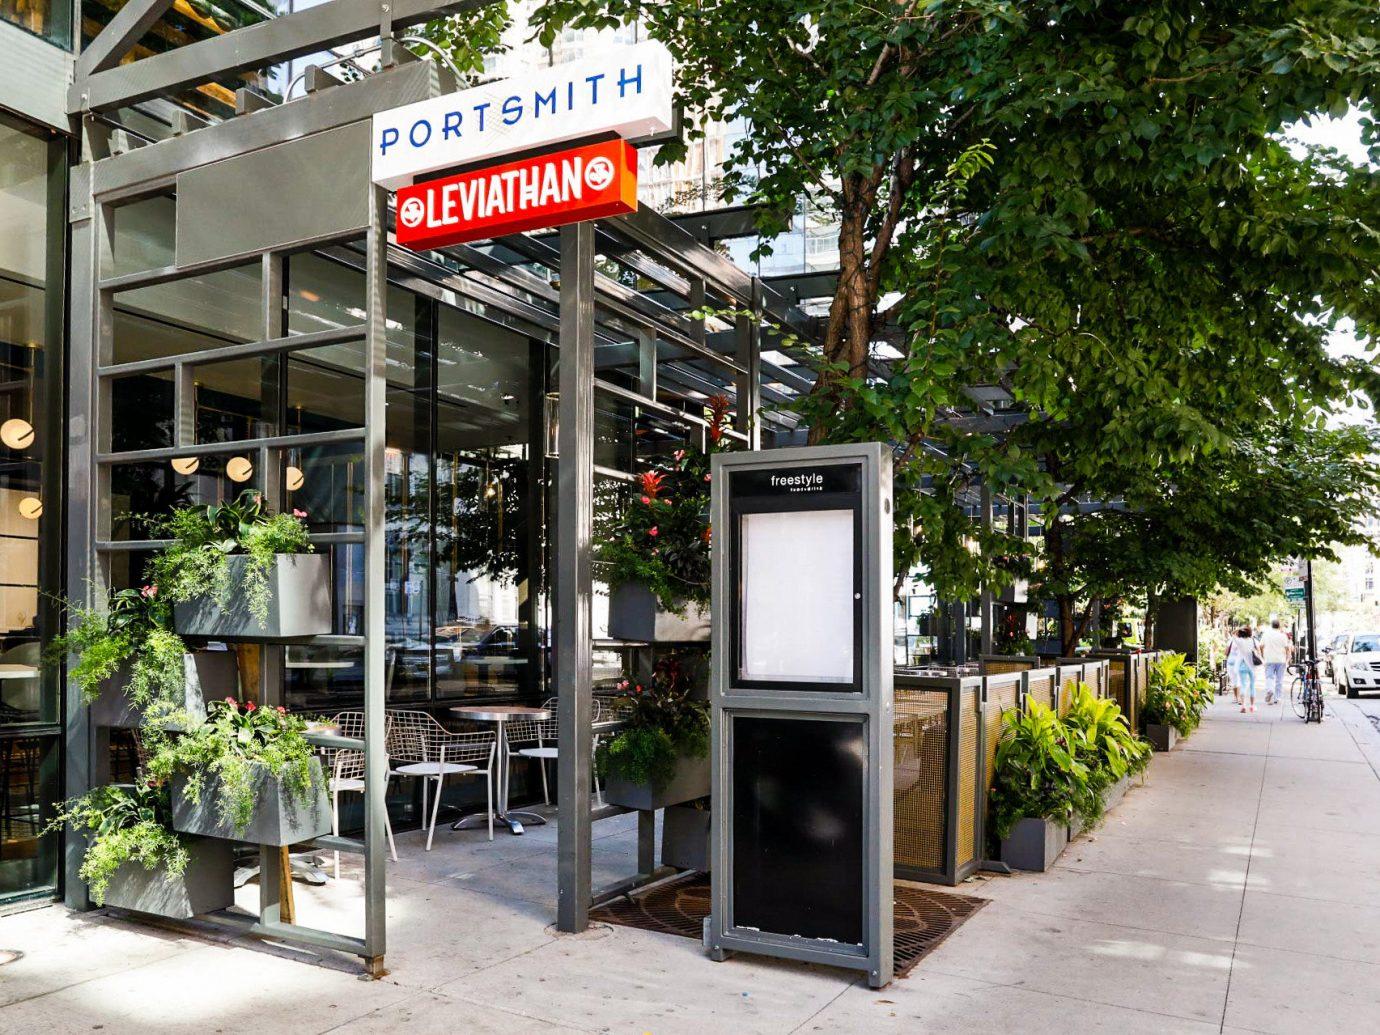 Food + Drink tree outdoor ground sidewalk City street curb